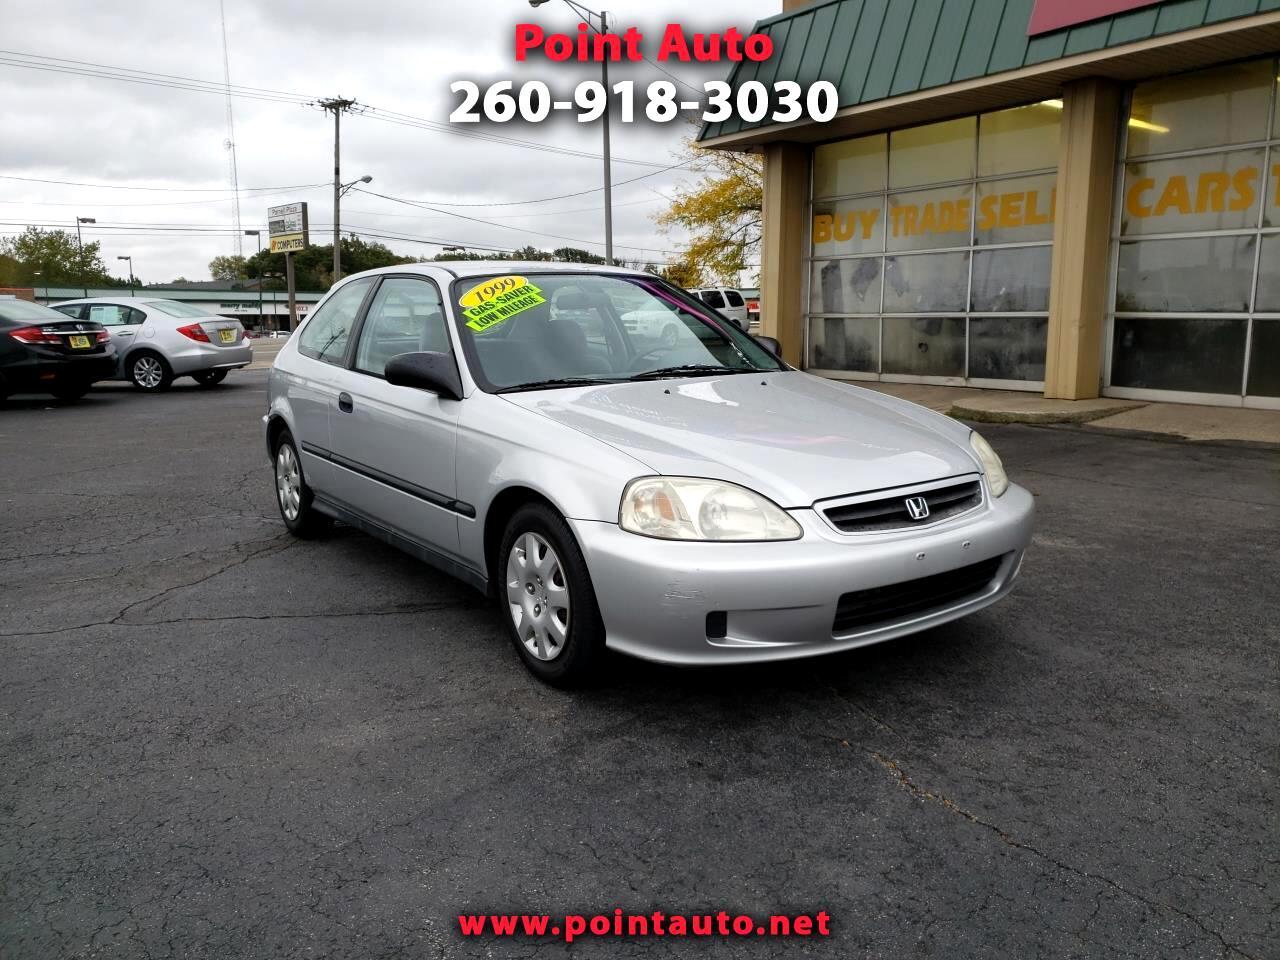 1999 Honda Civic DX hatchback